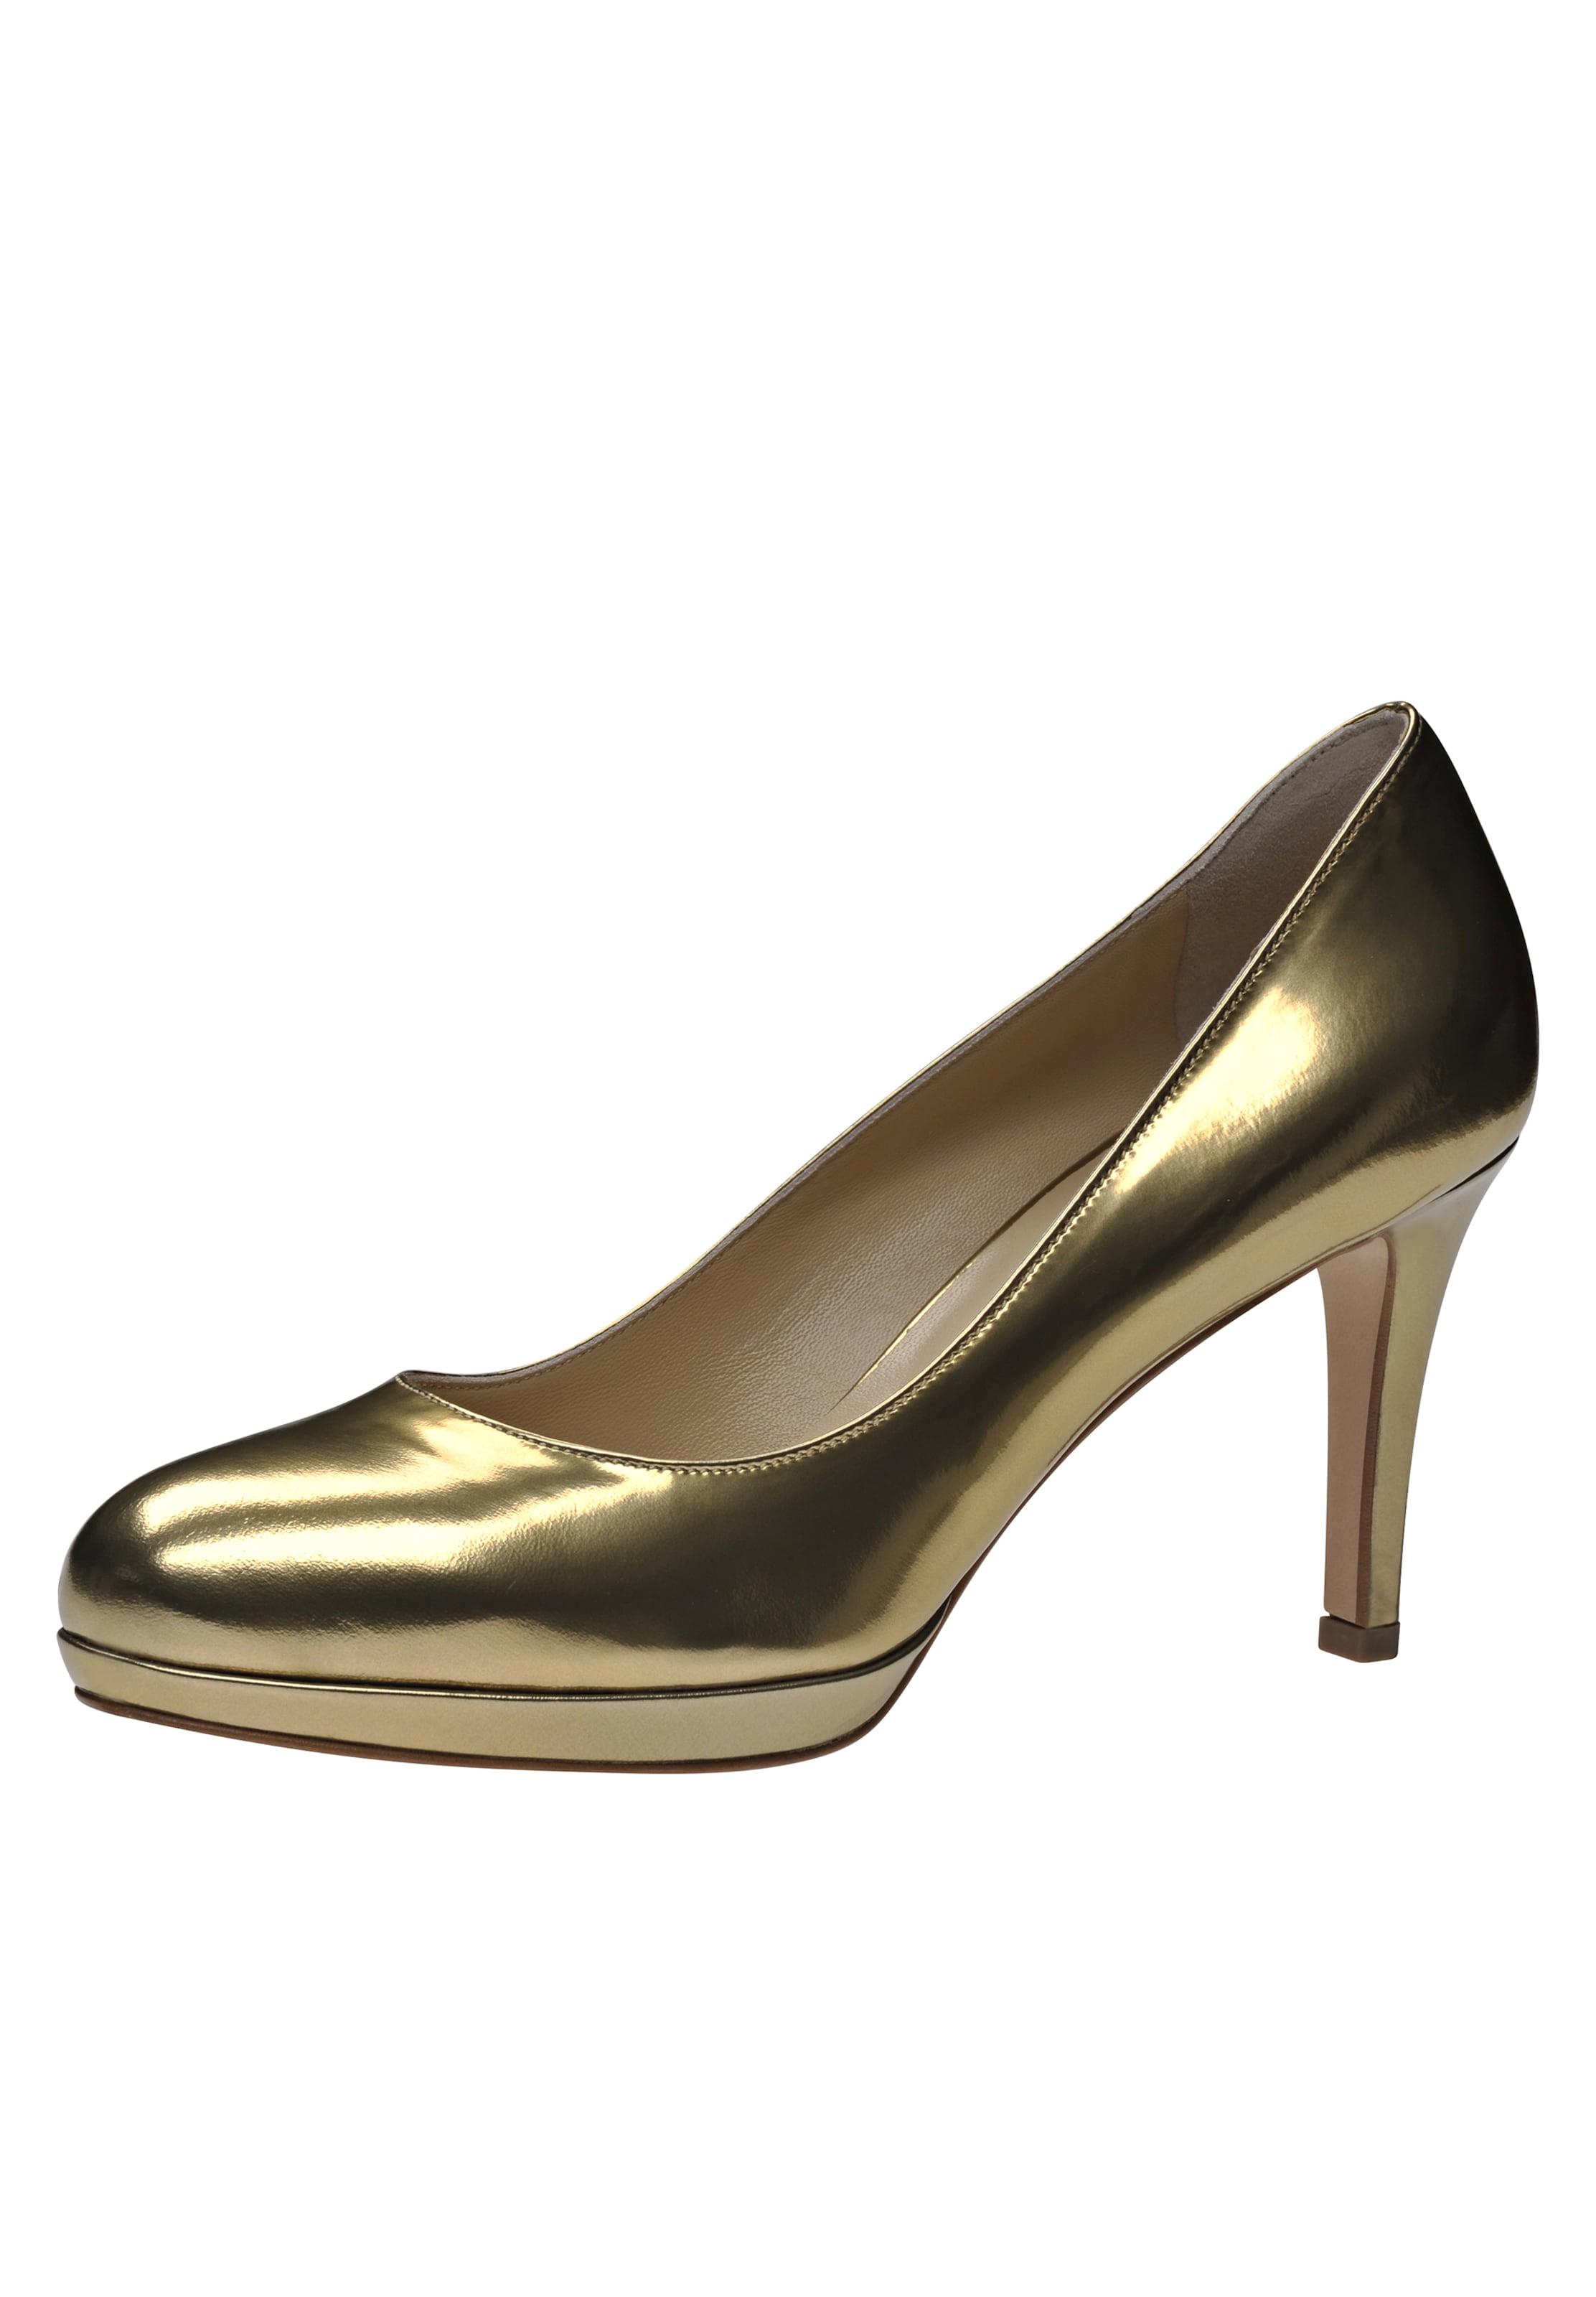 Gold Pumps In In In Evita Pumps Pumps Pumps Evita Evita Gold Gold Evita xWoerdCB